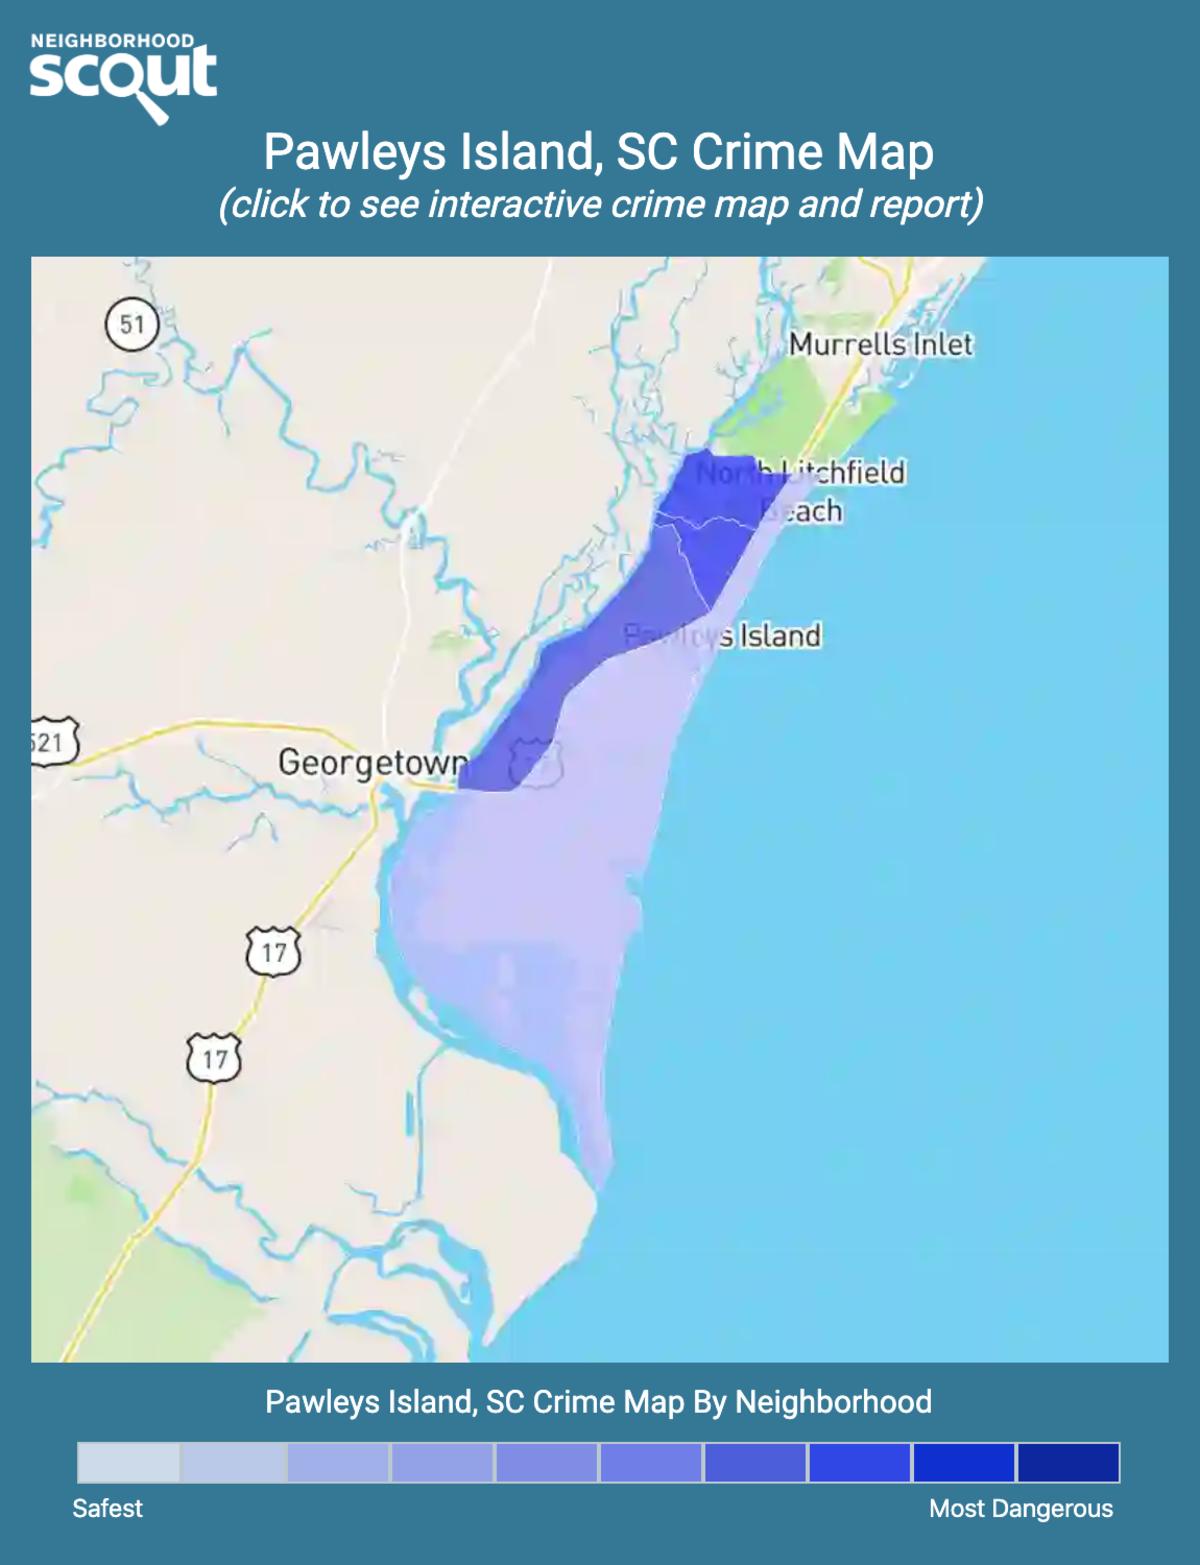 Pawleys Island, South Carolina crime map